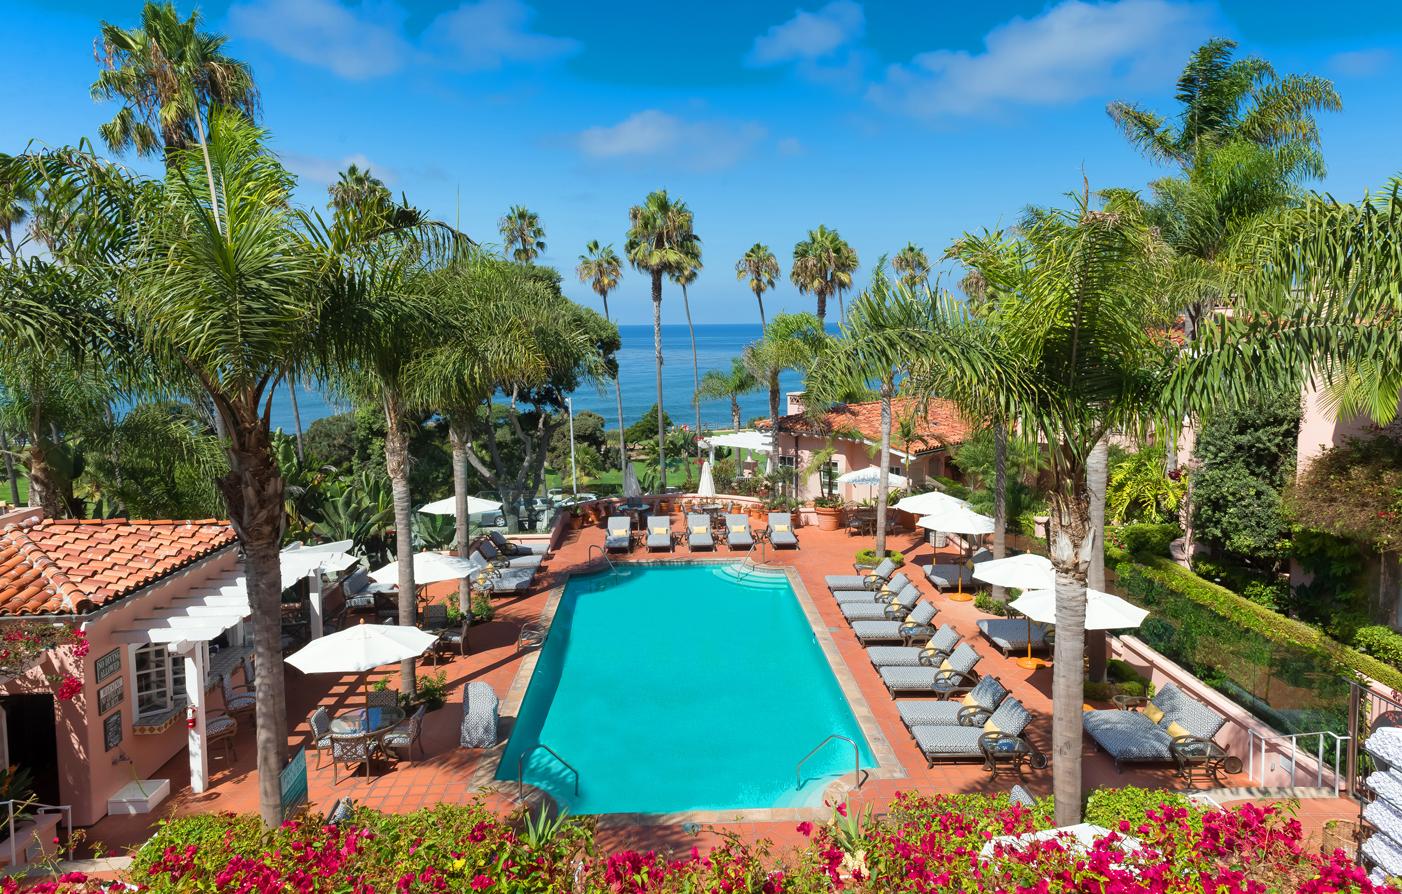 The Paradise Motel Hollywood Landmines